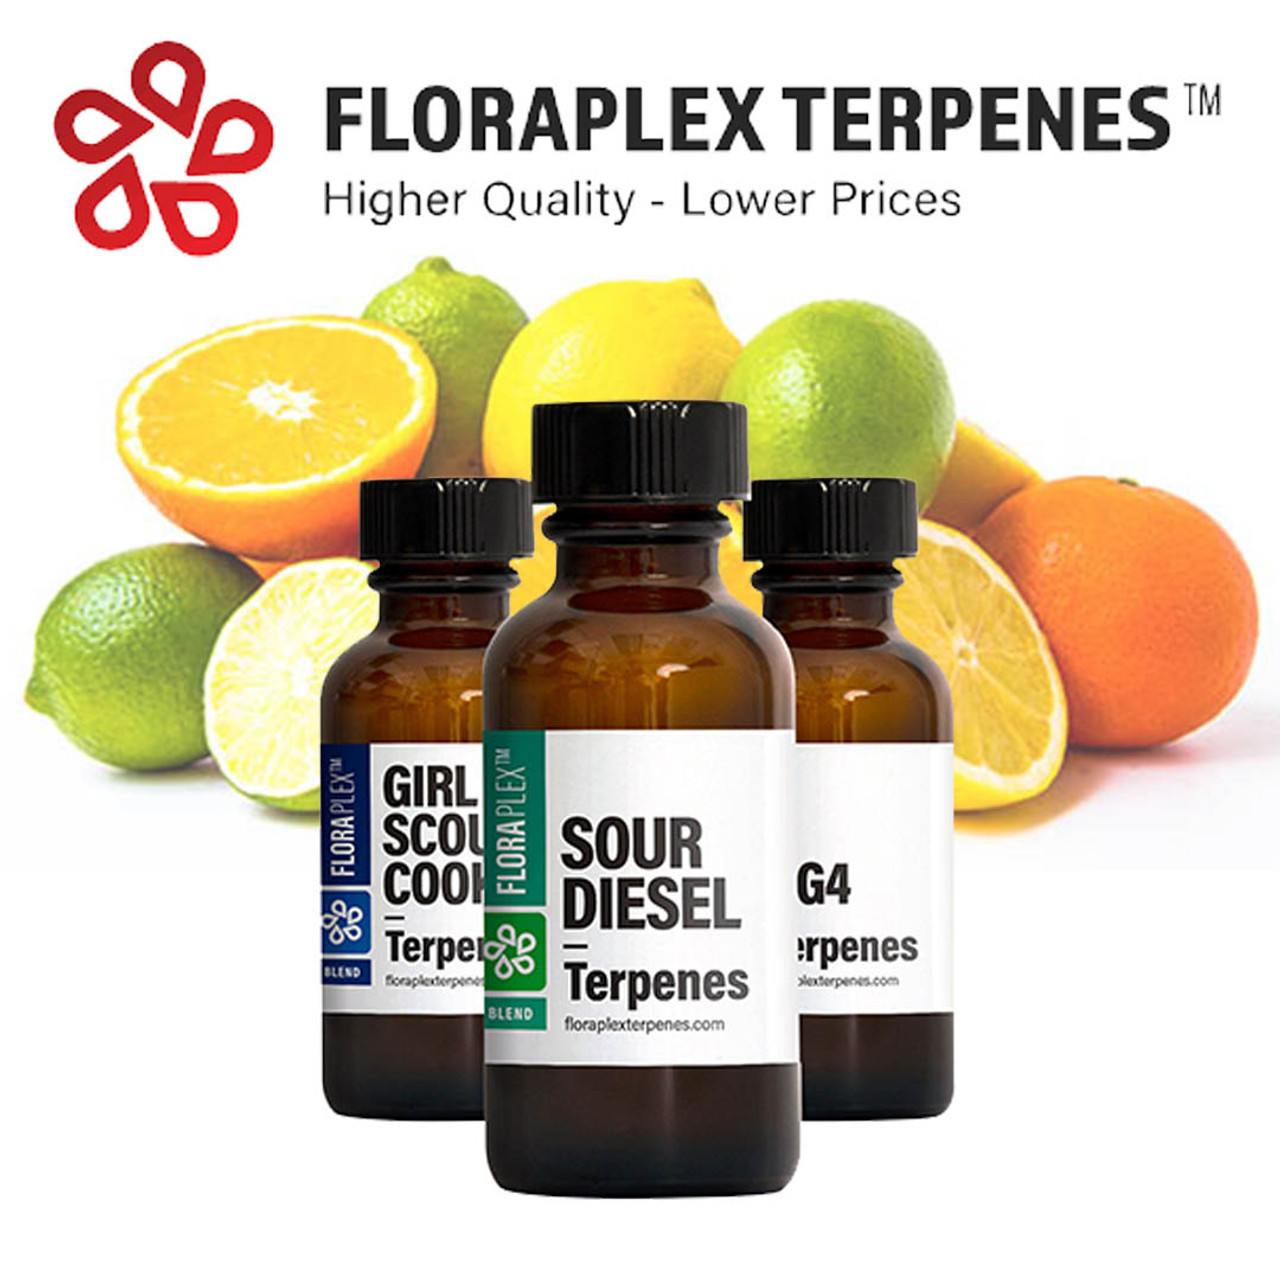 Floraplex Terpenes (Ground Shipping Only)- 4oz. Super sale!